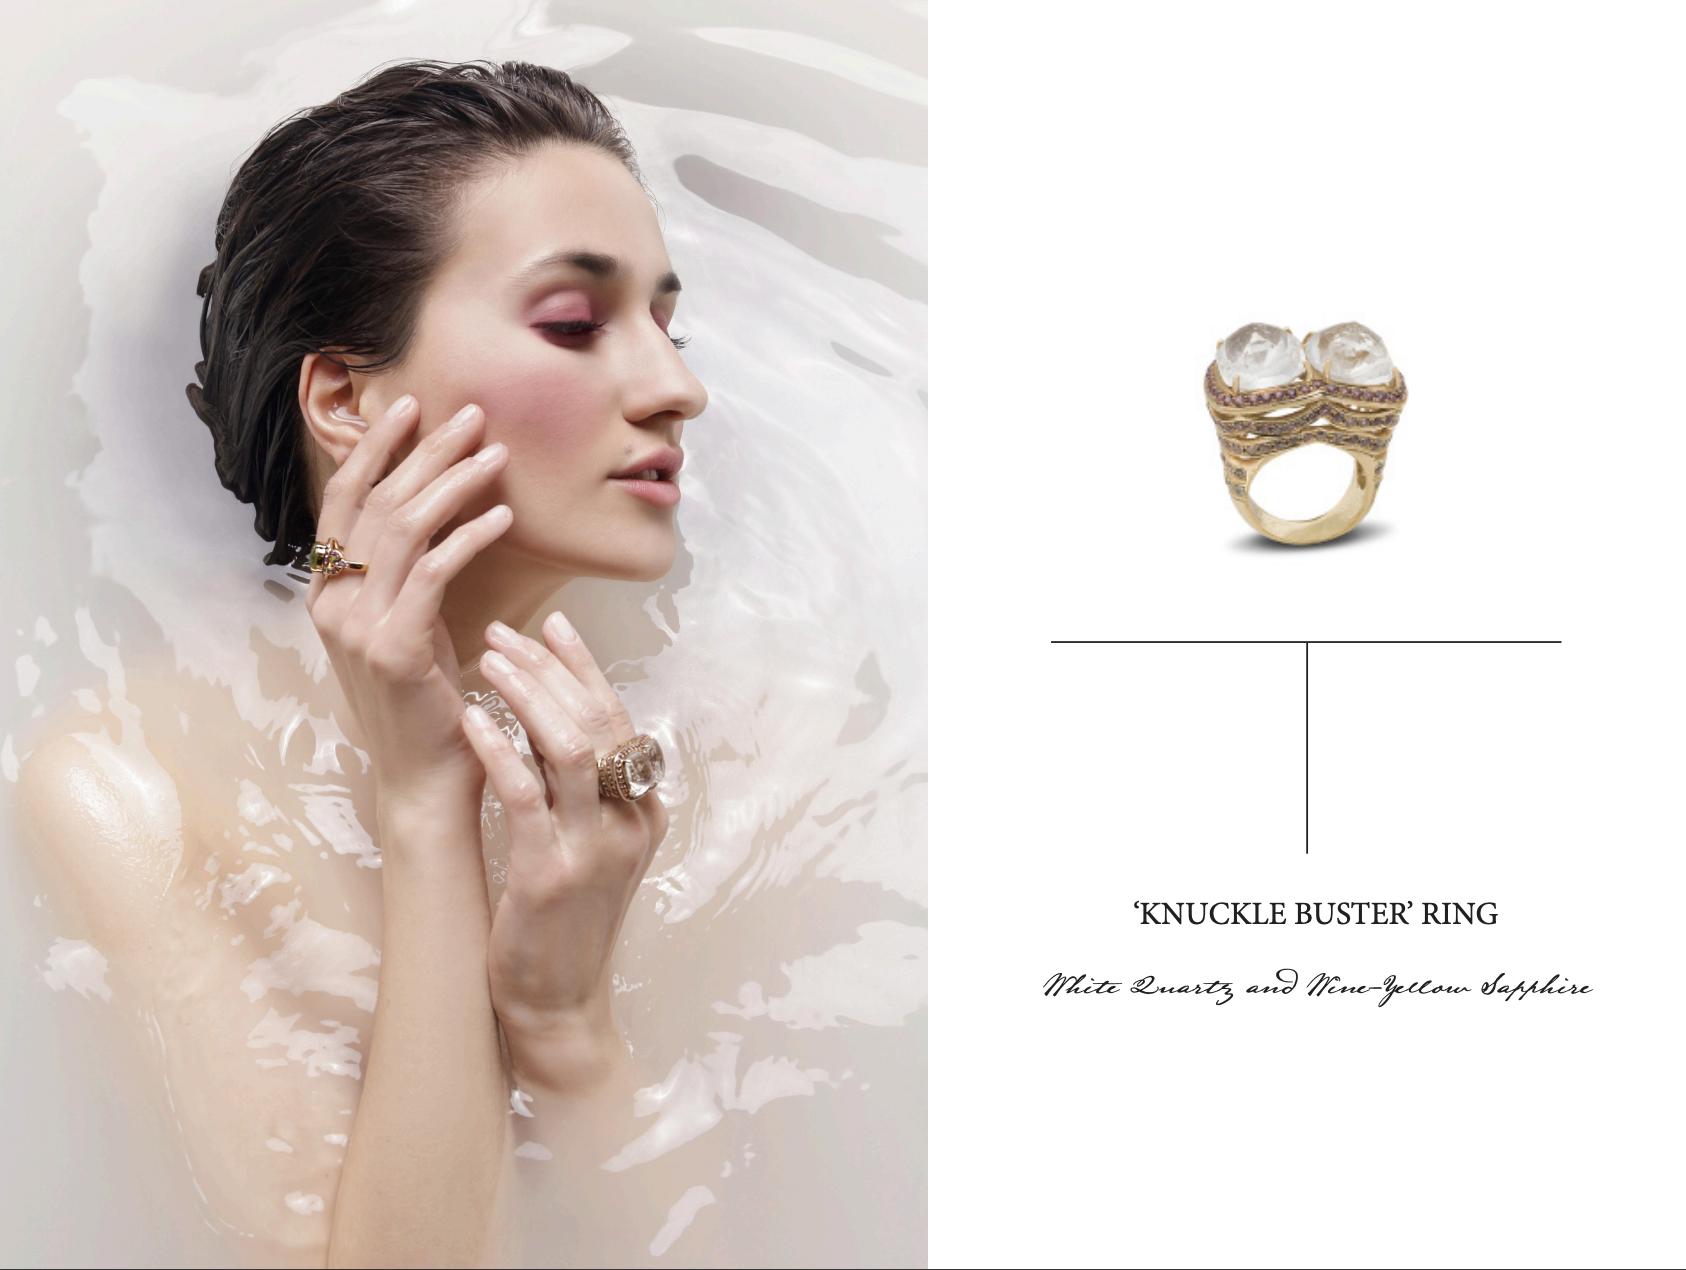 republic of toma jewelry - press kit design sarah pottharst 9.png